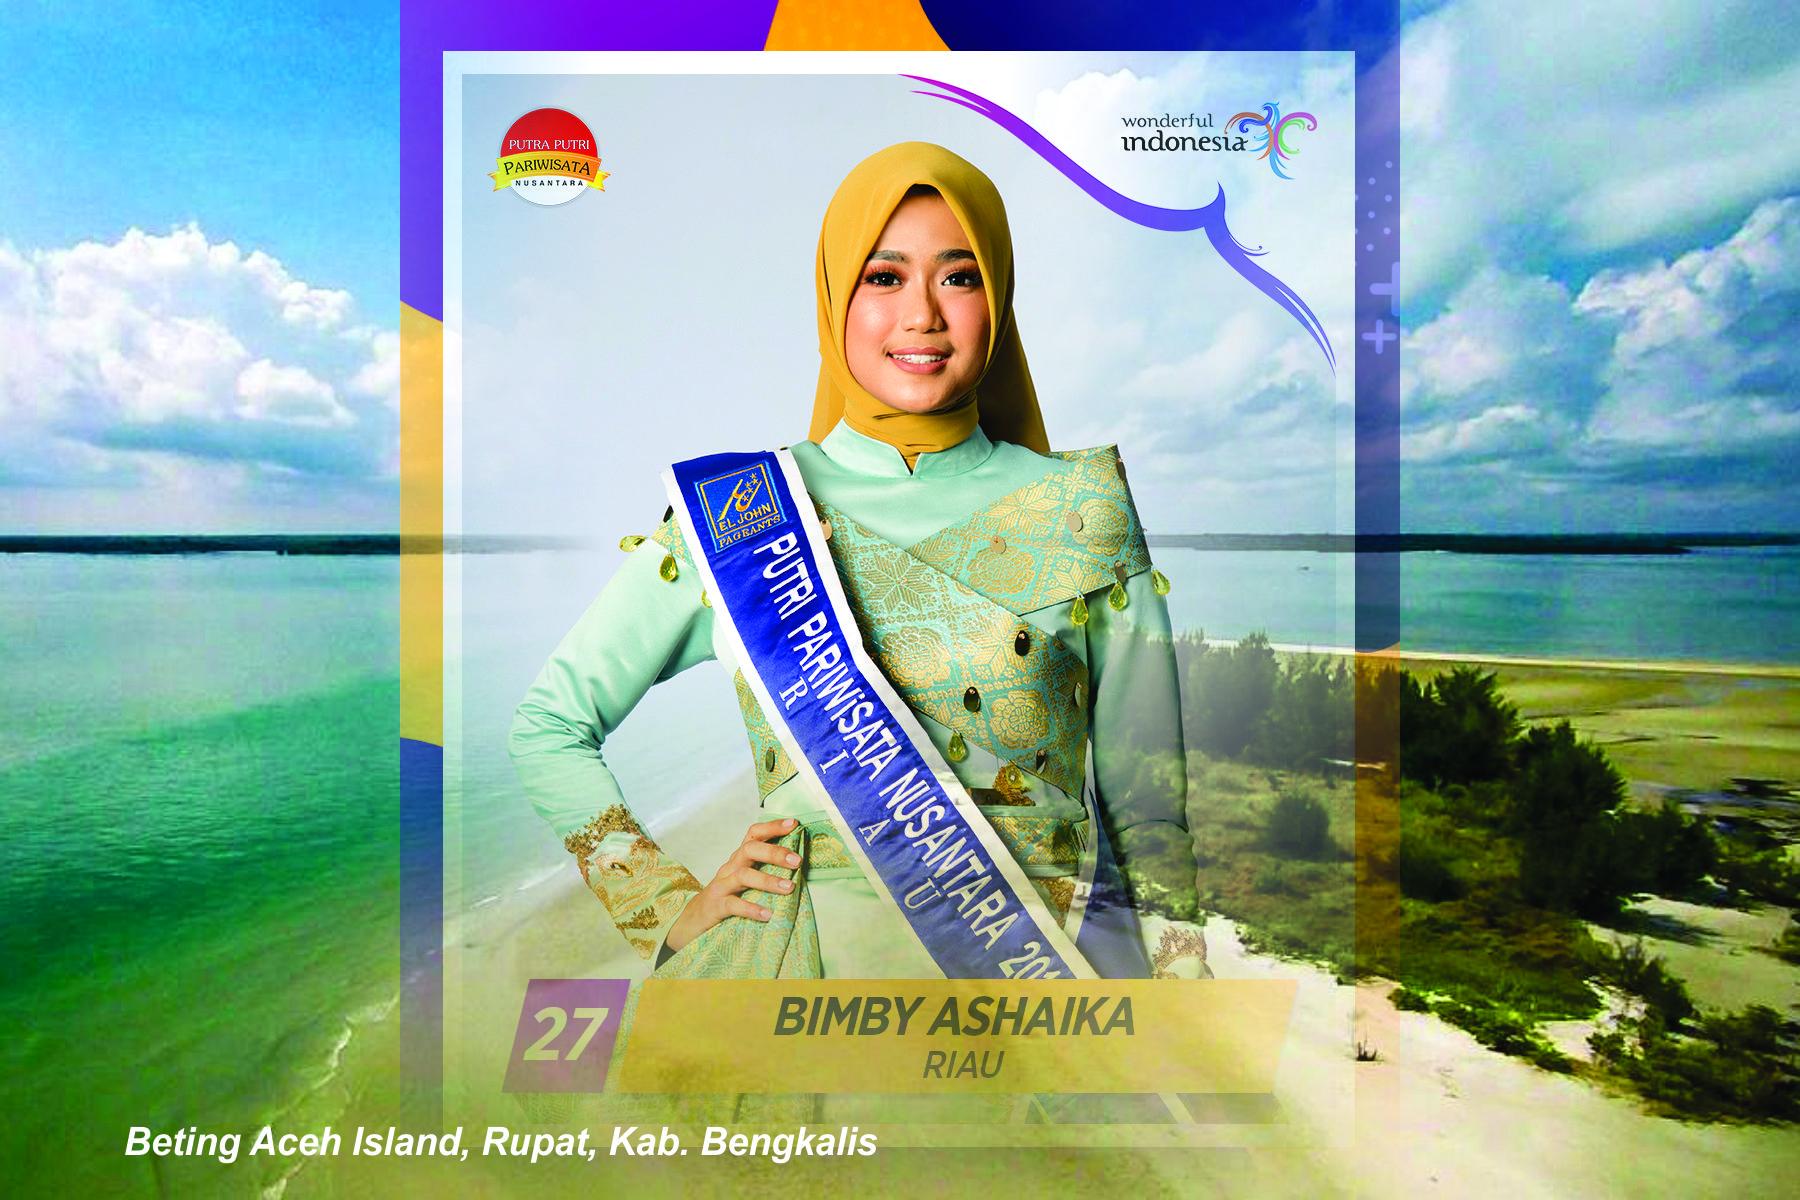 Masih Runner Up, Bimby Ashaika Masih Harapkan Dukungan Masyarakat Riau